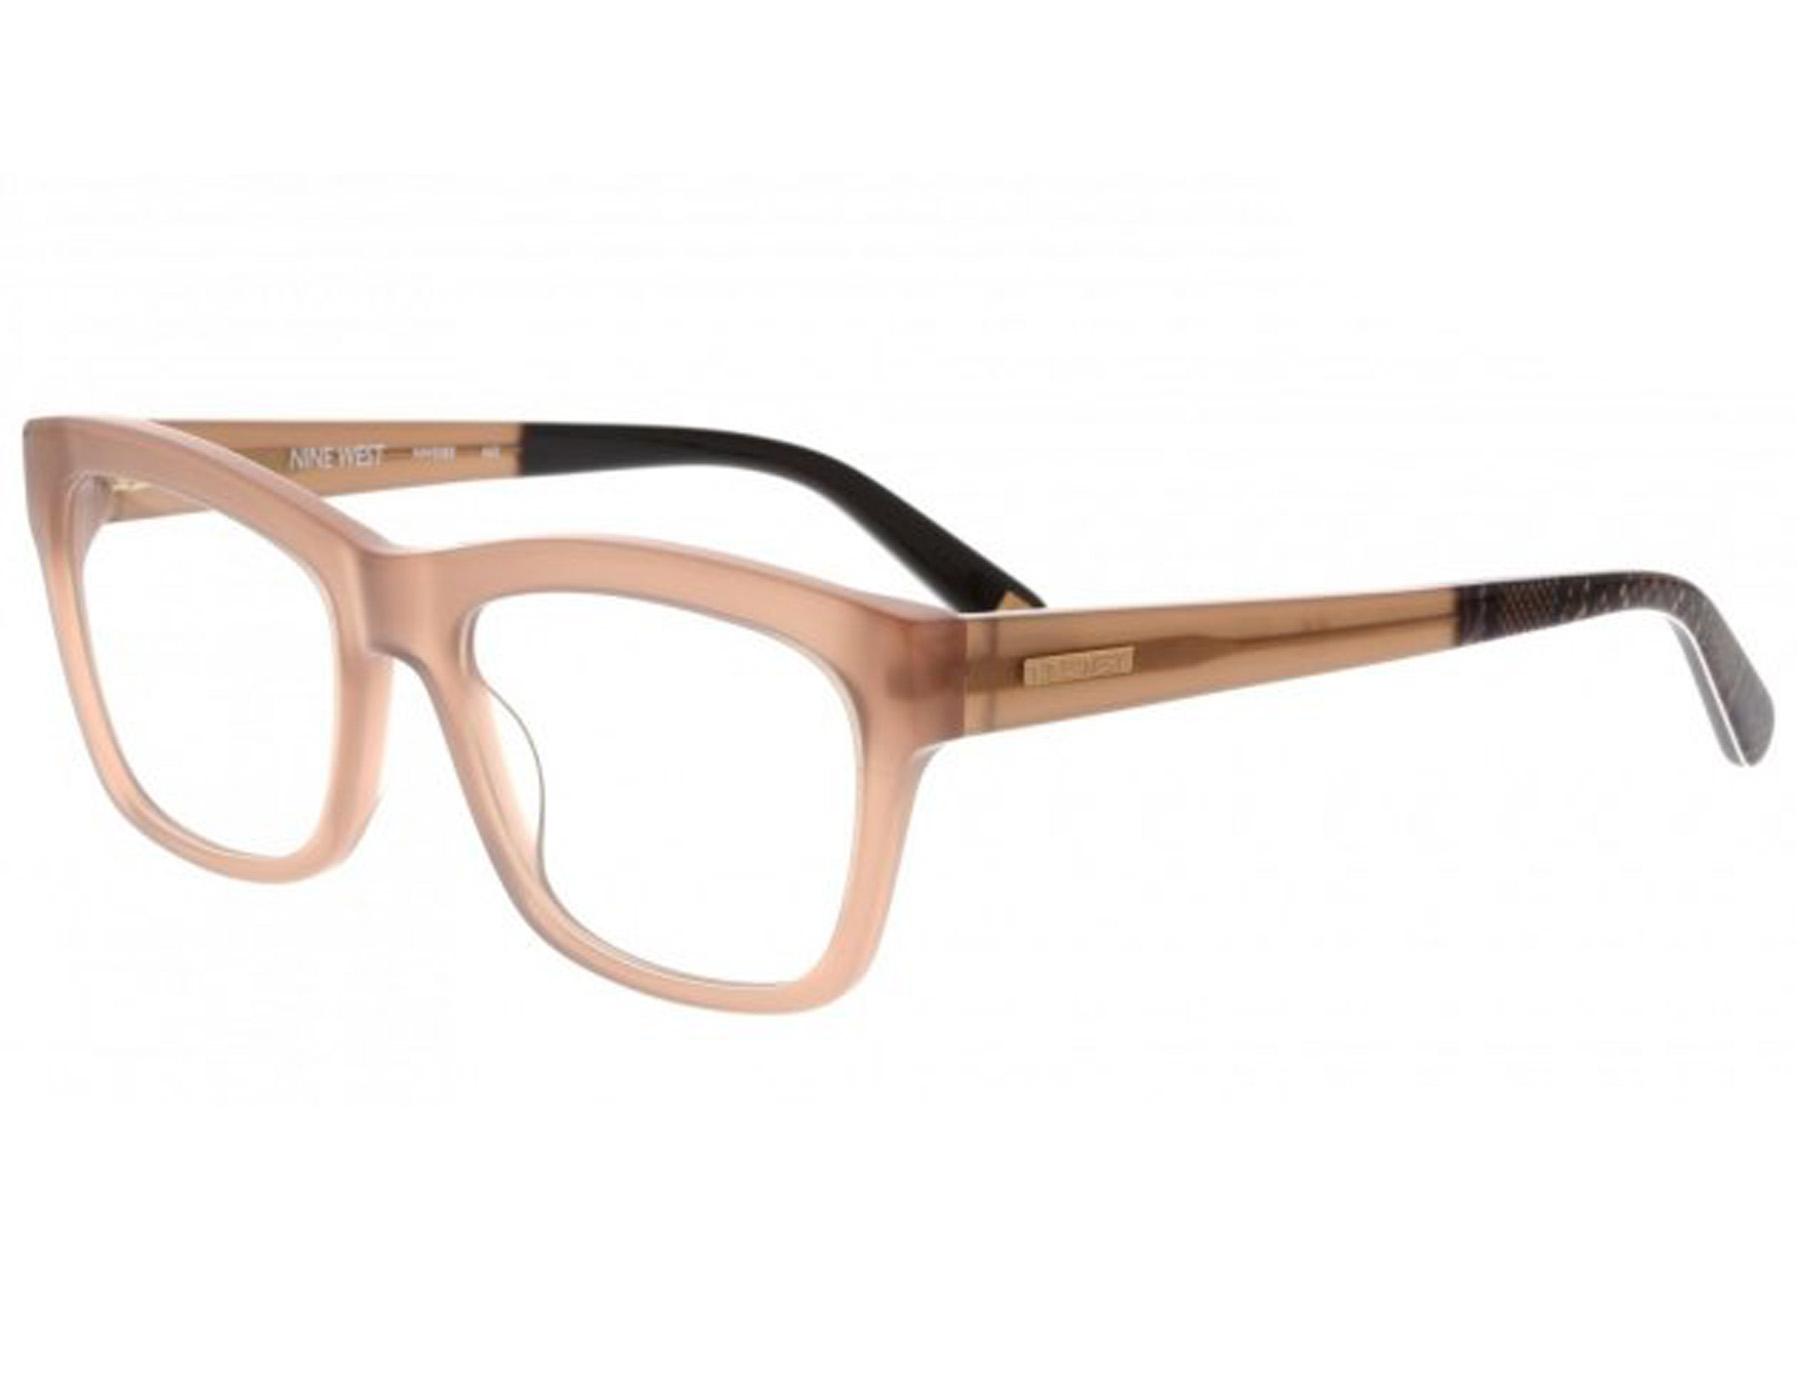 NEW Nine West NW5083 665 53mm Blush Optical Eyeglasses Frames